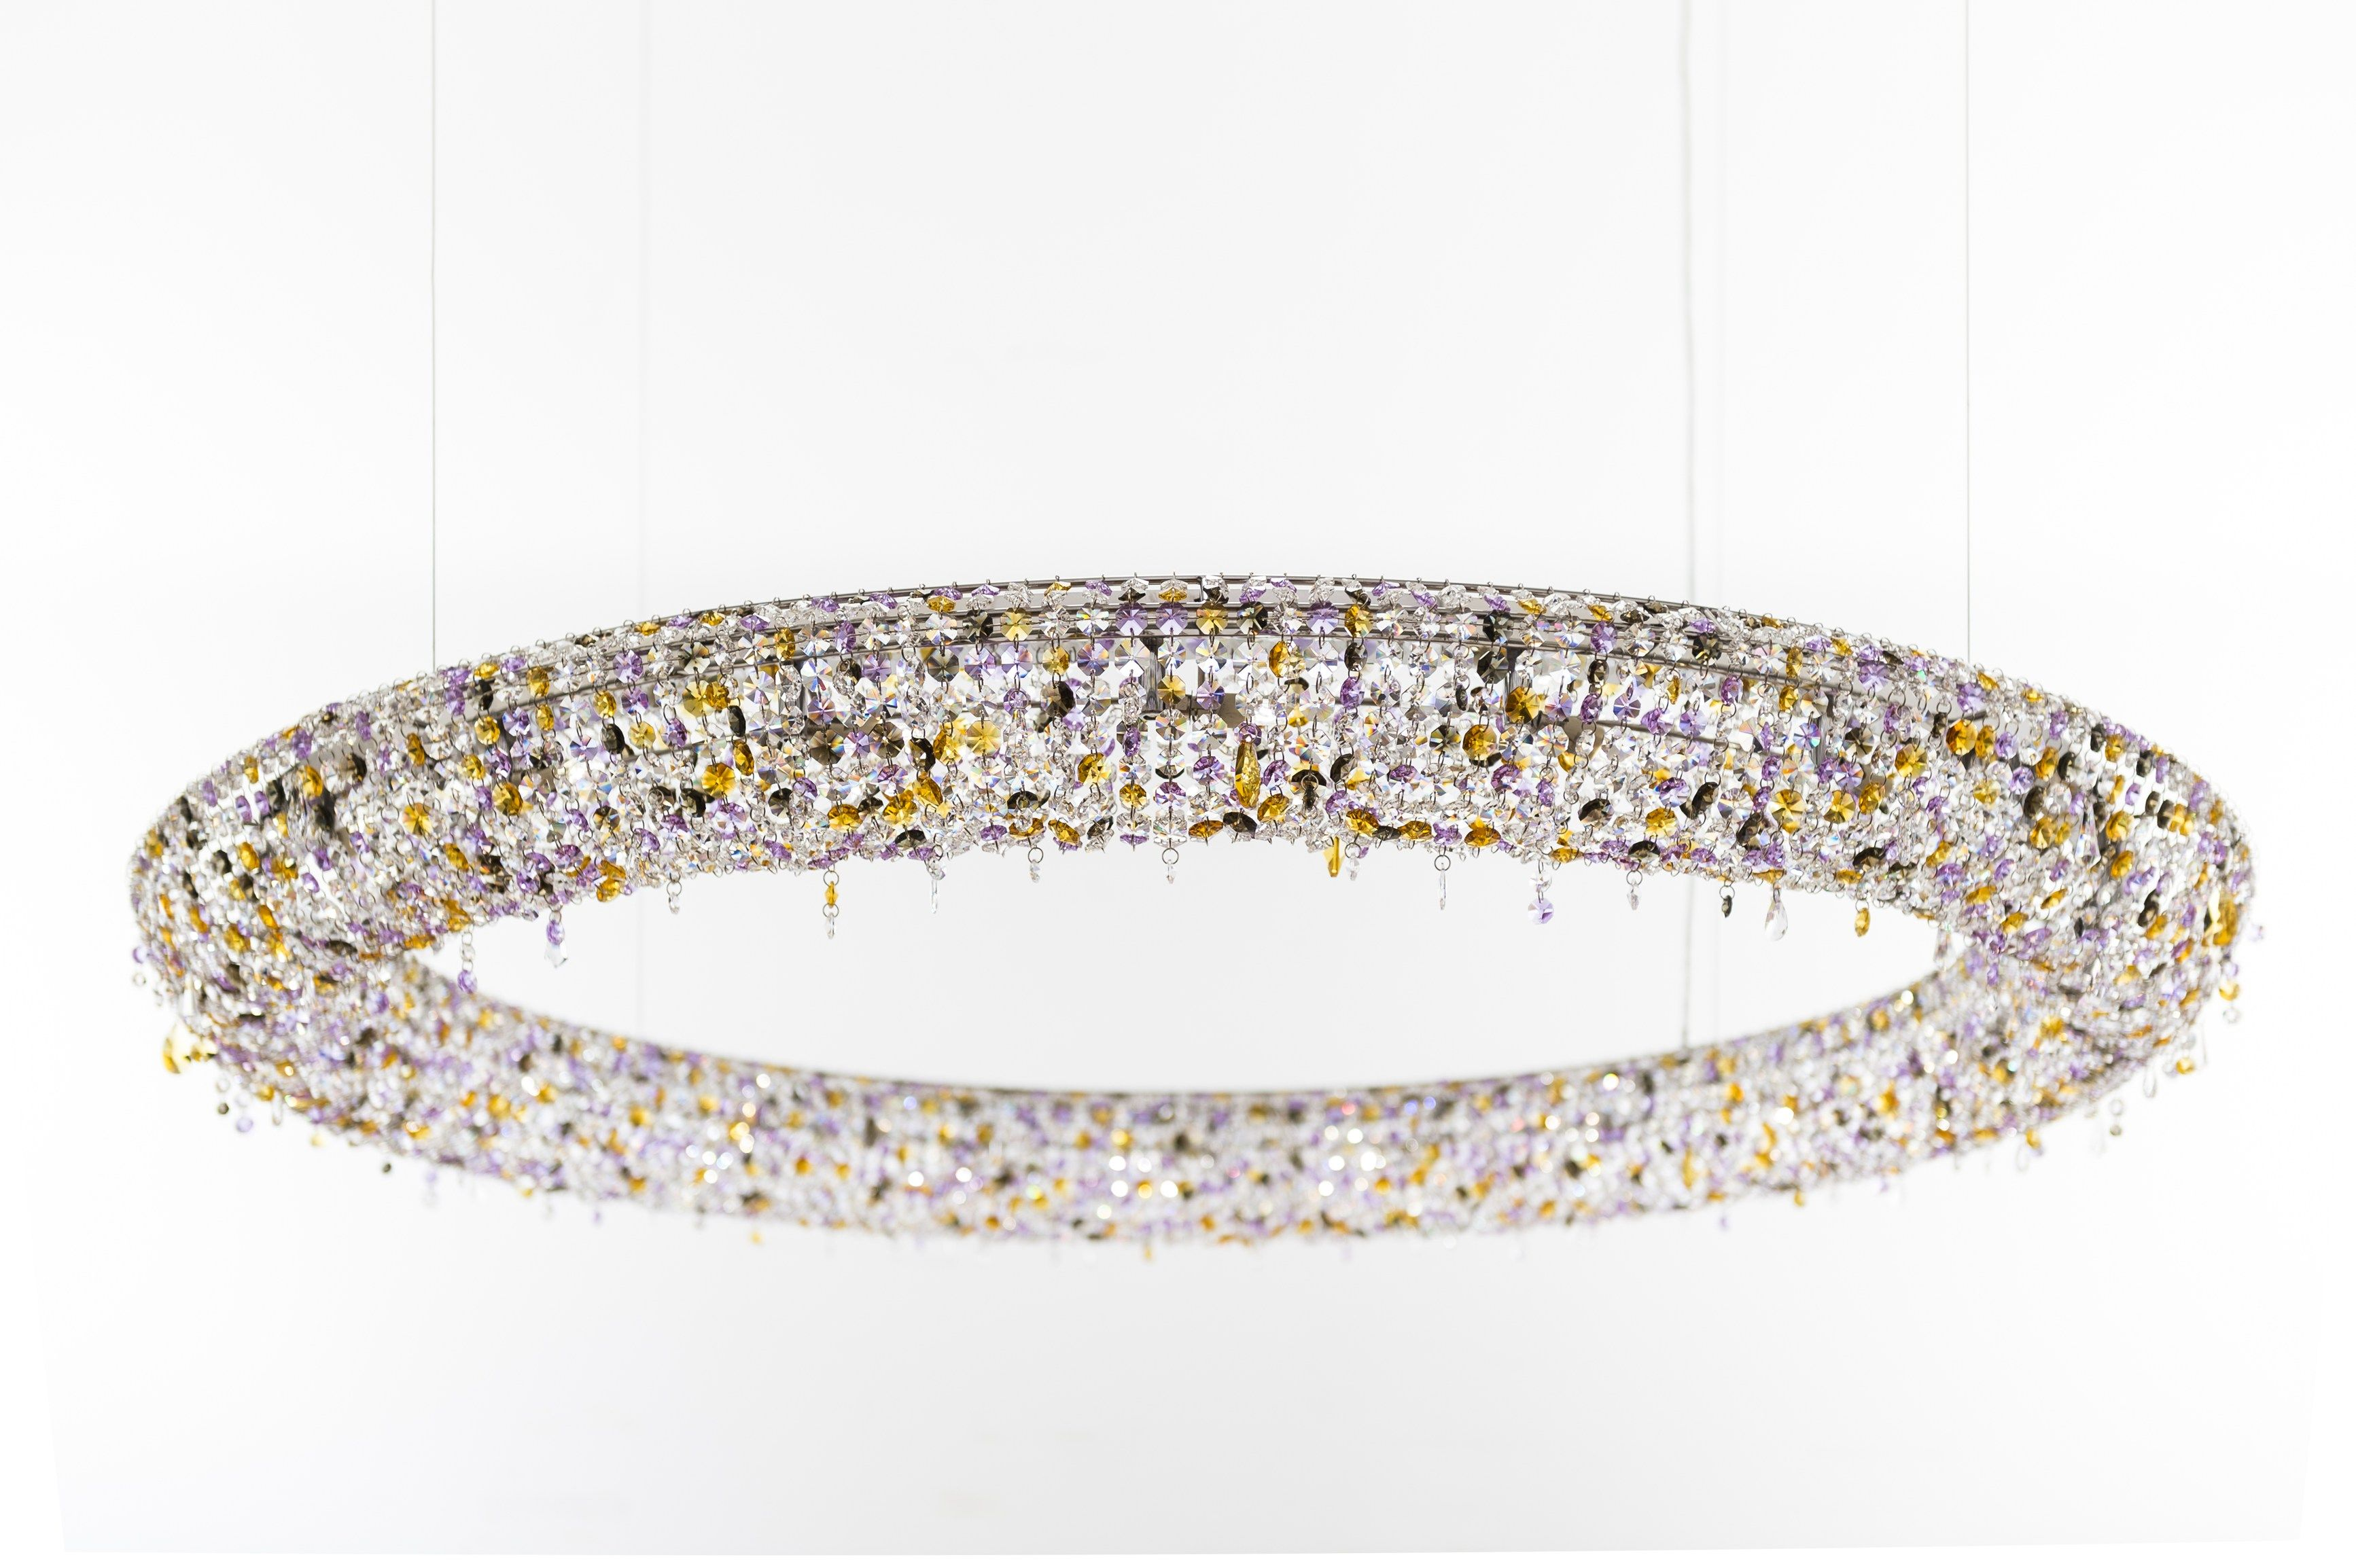 Looop crystal chandelier #Manooi #crystalchandelier #chandelier #lighting #design  #Looop #luxury #furniture